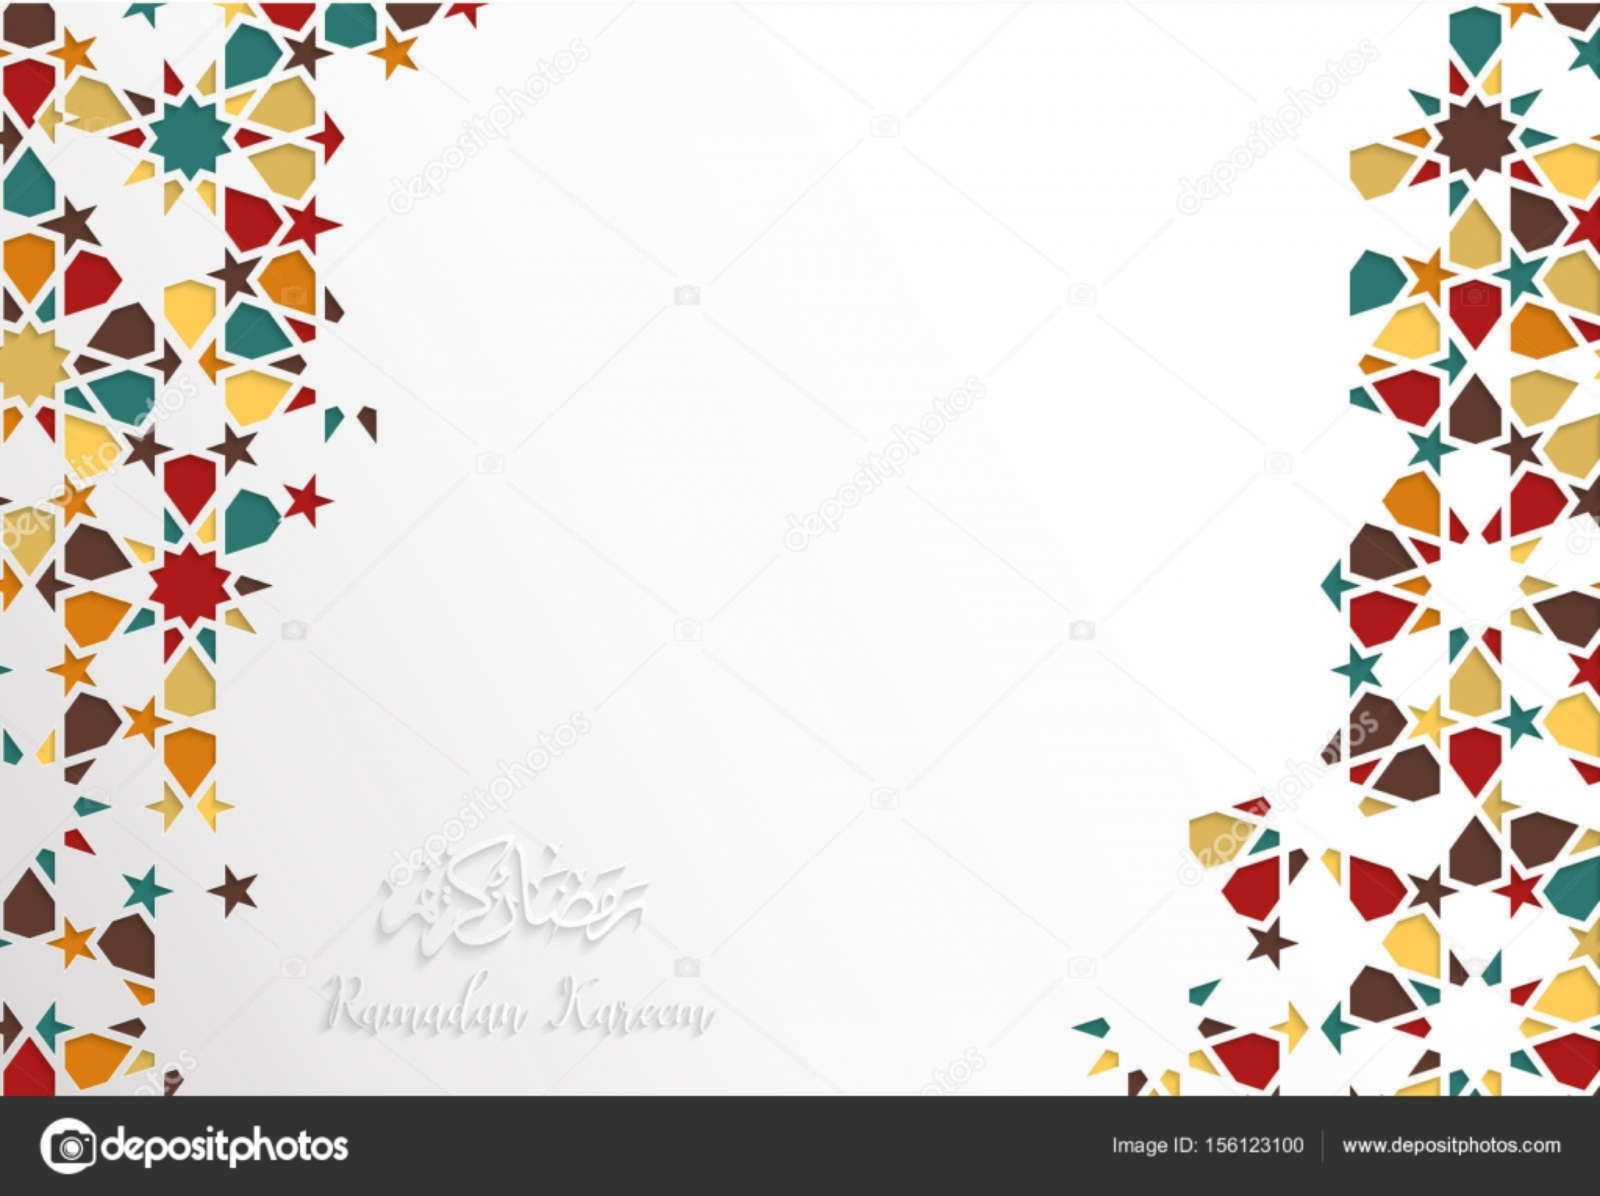 Wallpaper Border Falling Off Islamic Design Greeting Card Template For Ramadan Kareem